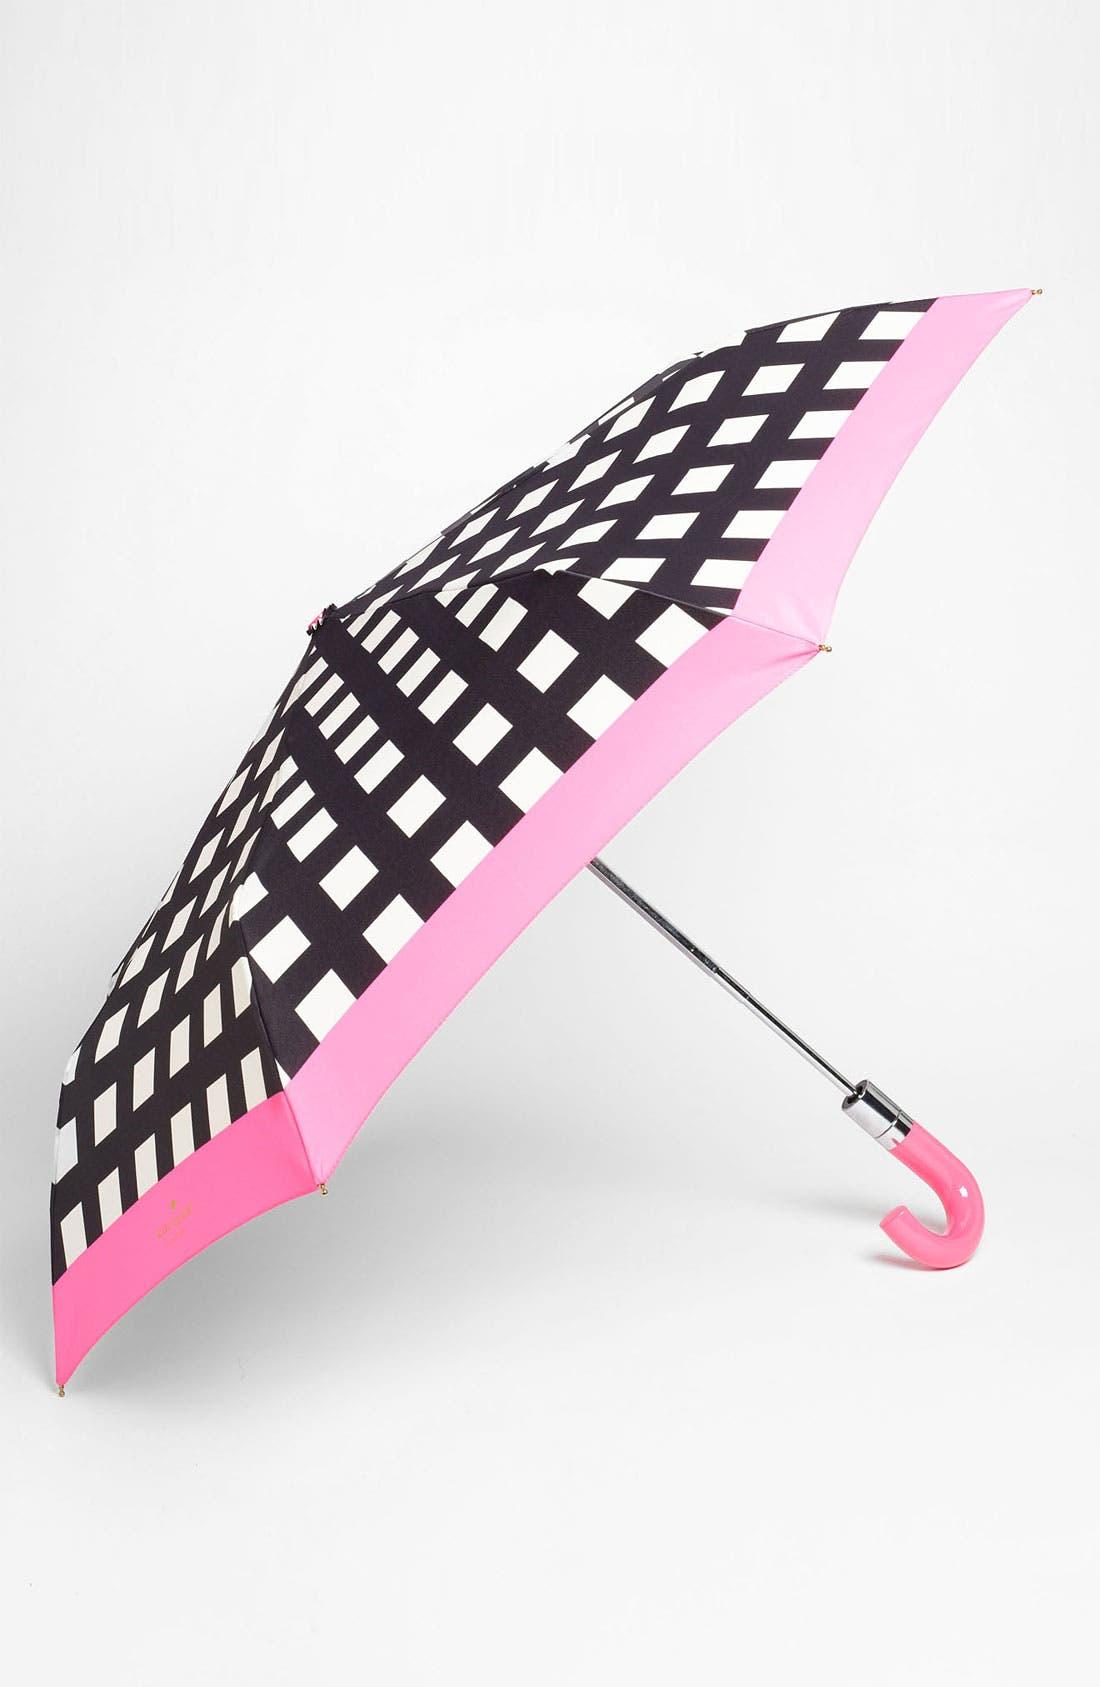 Alternate Image 1 Selected - kate spade new york 'pop art' check umbrella